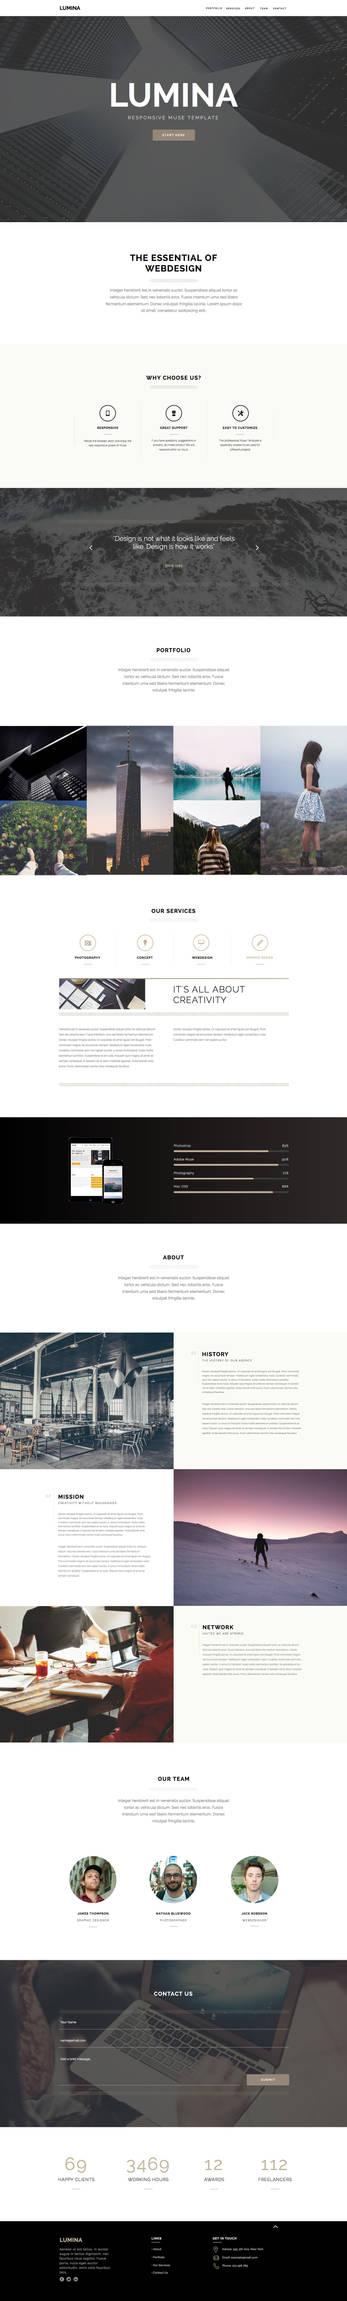 Lumina - Responsive OnePage Muse Template